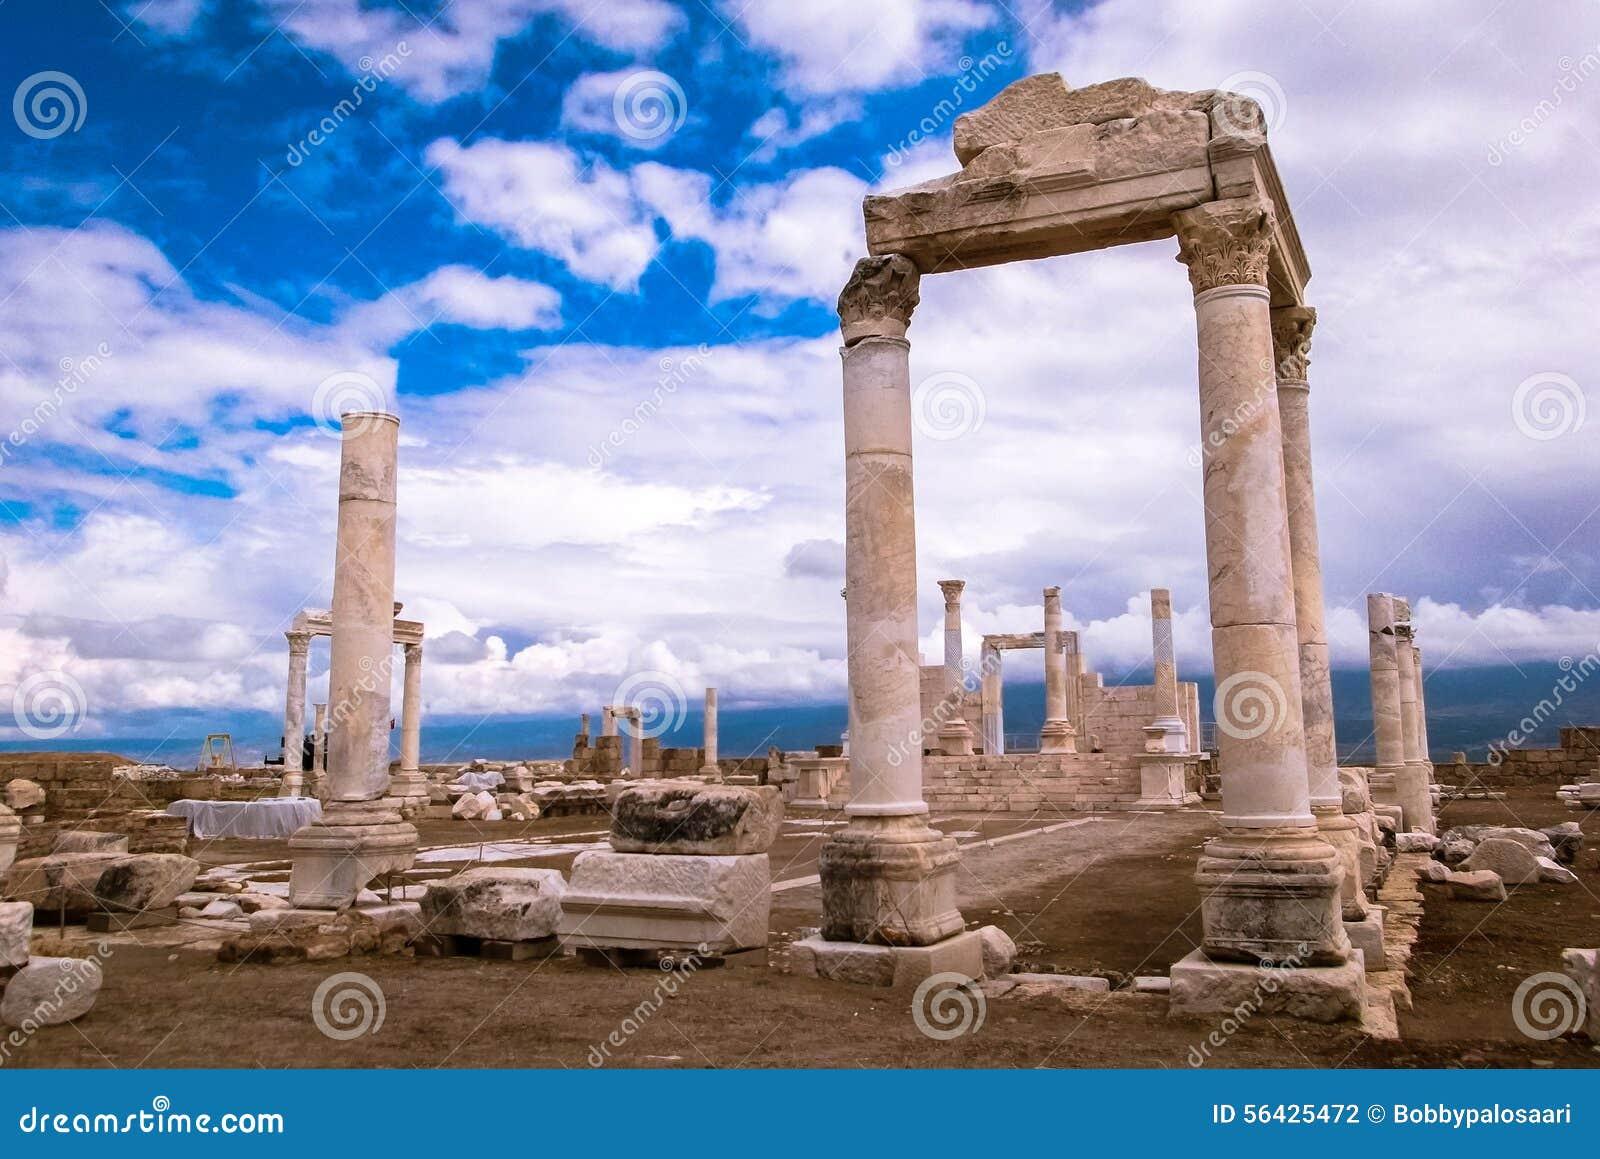 Ancient Ruins Of Laodicea Turkey Stock Photo - Image: 56425472